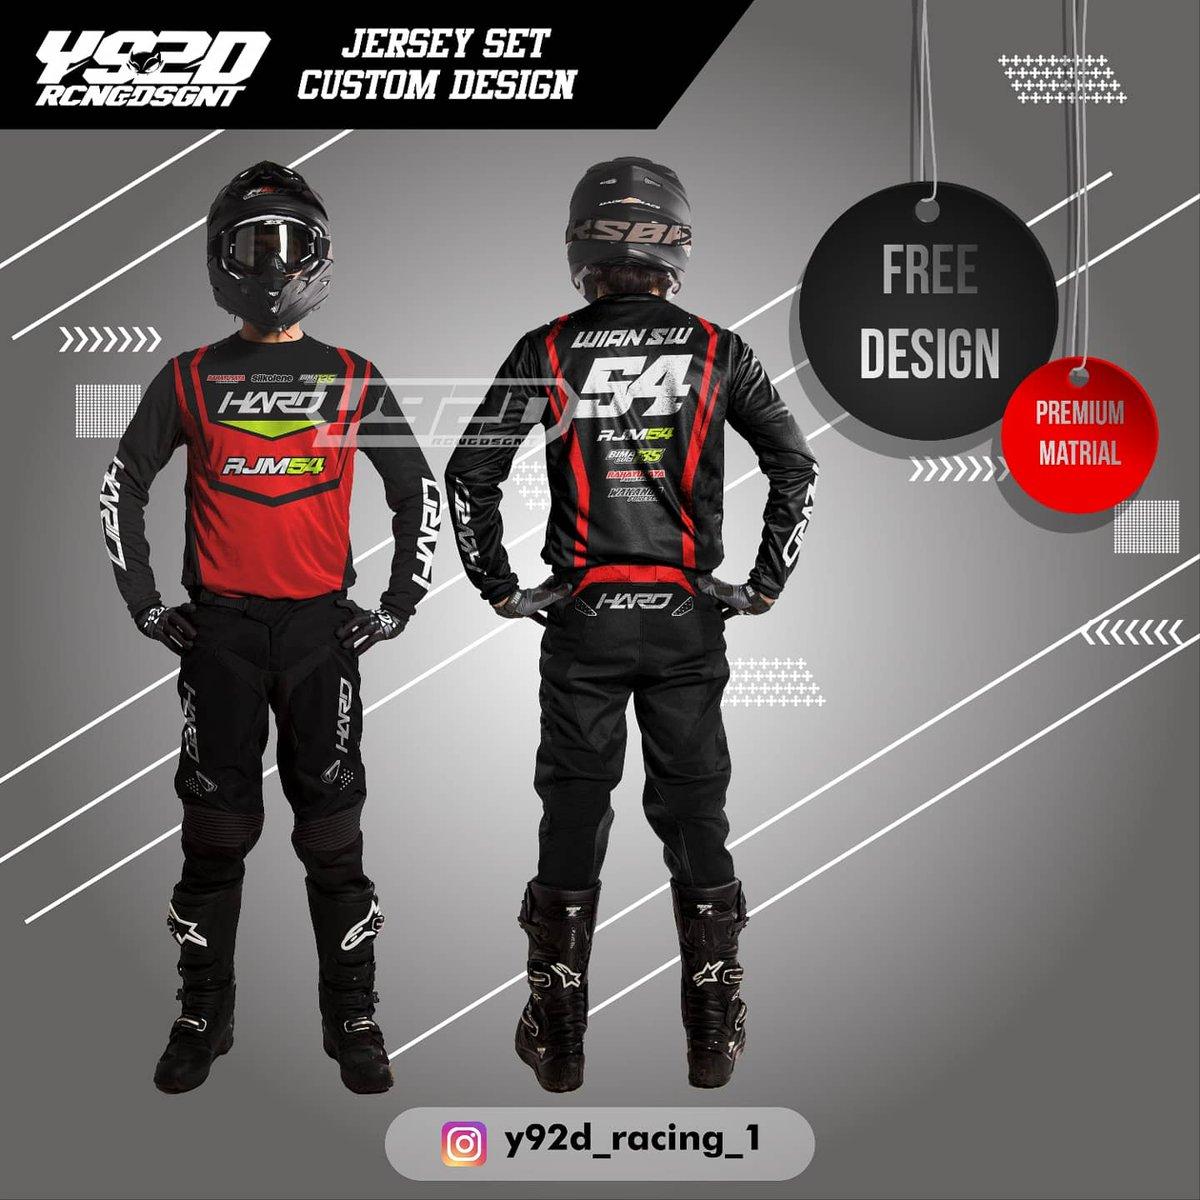 Arnol Ayesha On Twitter Jasa Mockup Jersey Set Motocross Jerey Mxgear Designer Mockup